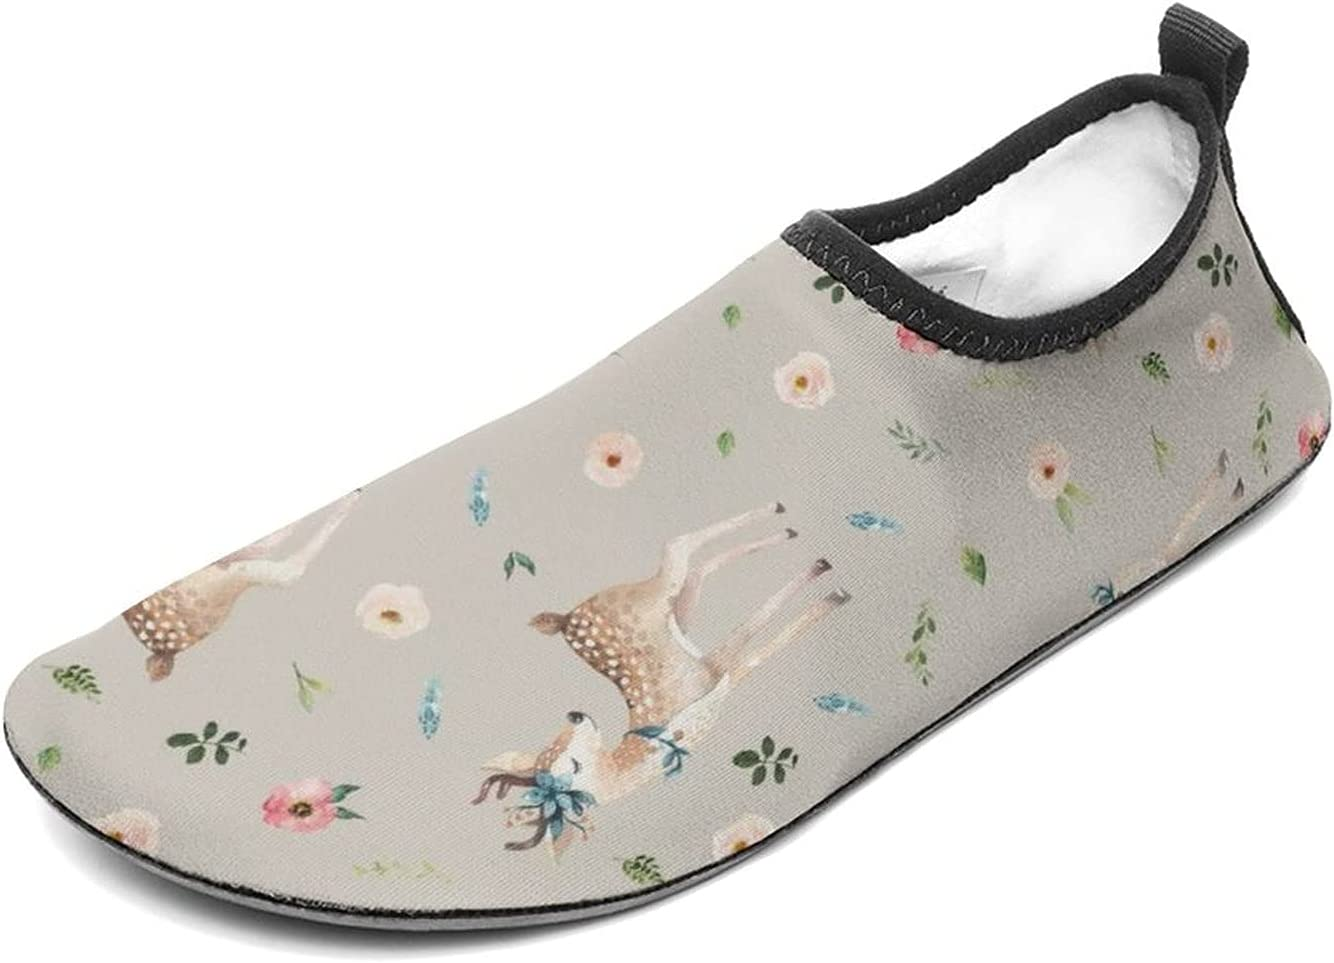 WEEDKEYCAT Max 59% OFF Max 86% OFF Floral Deer Fun Water Shoes Socks for Men Aqua Women